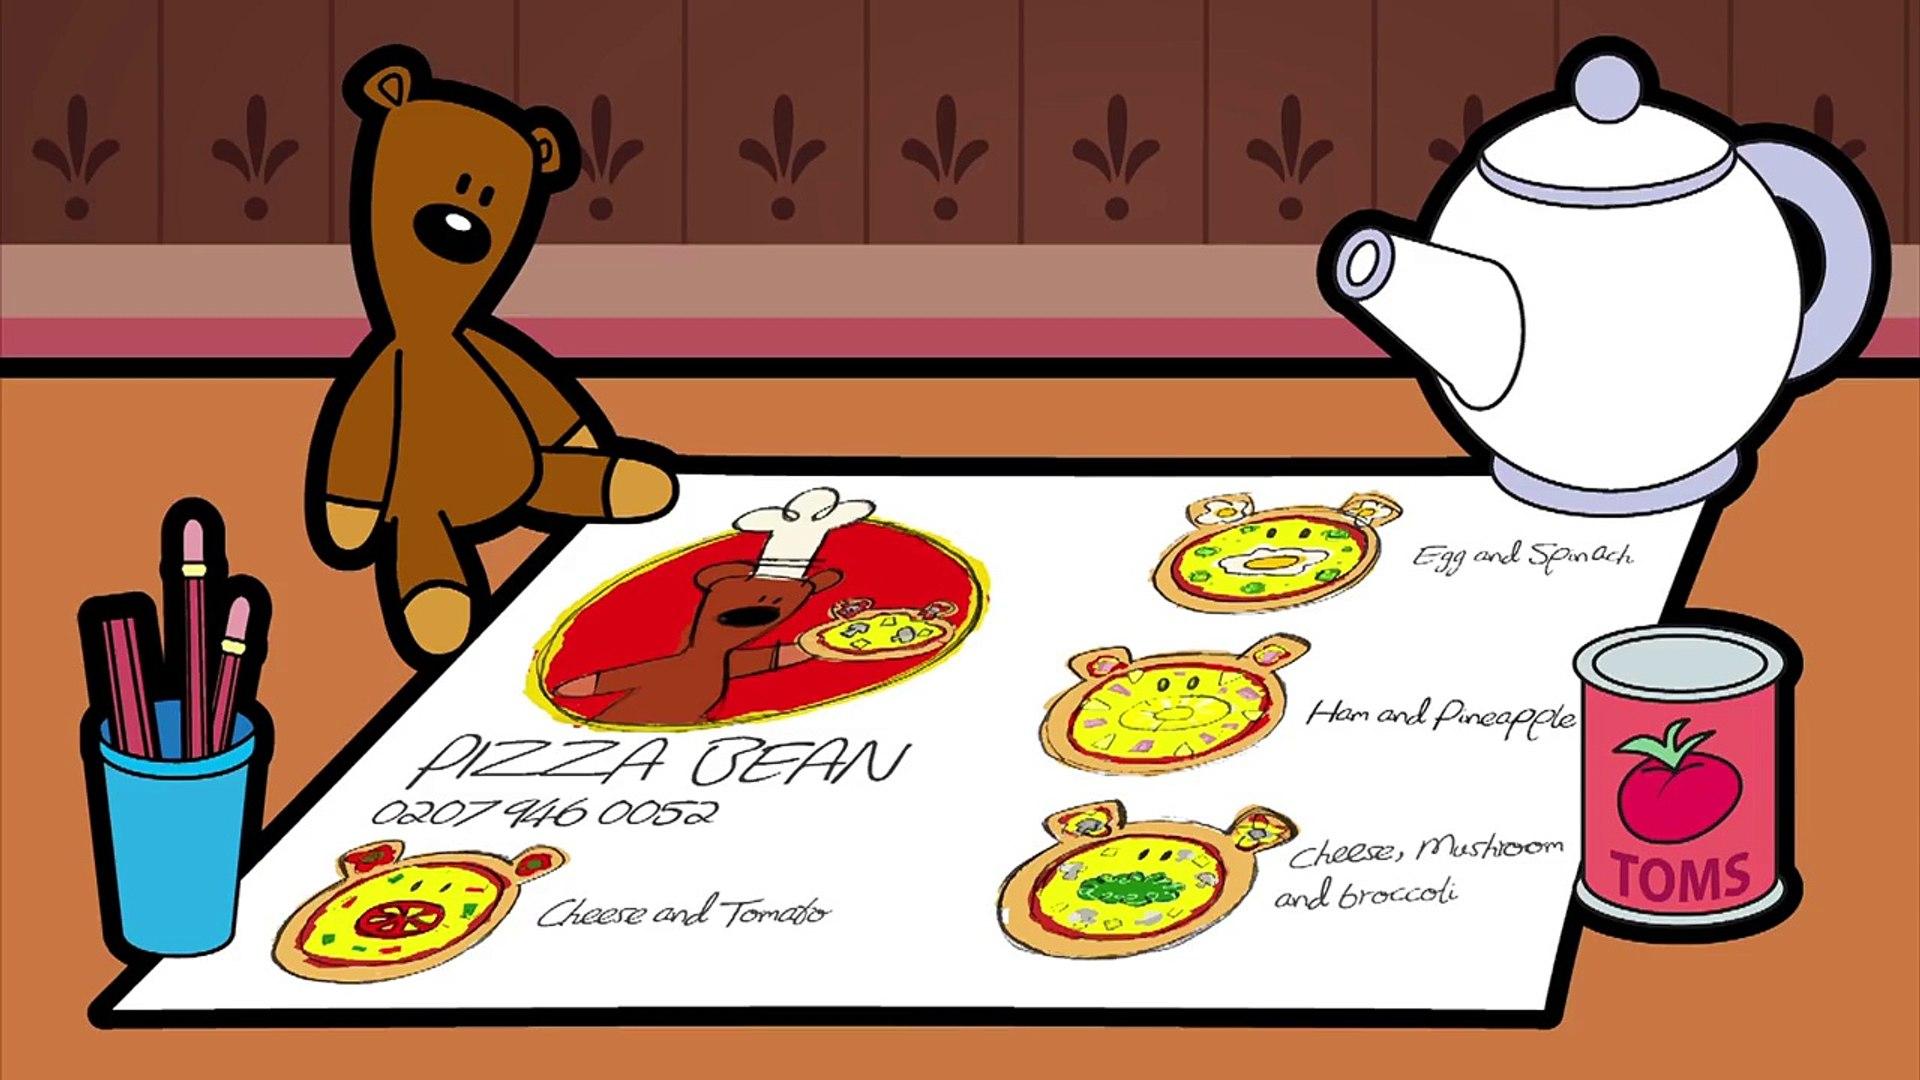 pizza bean mr bean wiki fandom powered by wikia